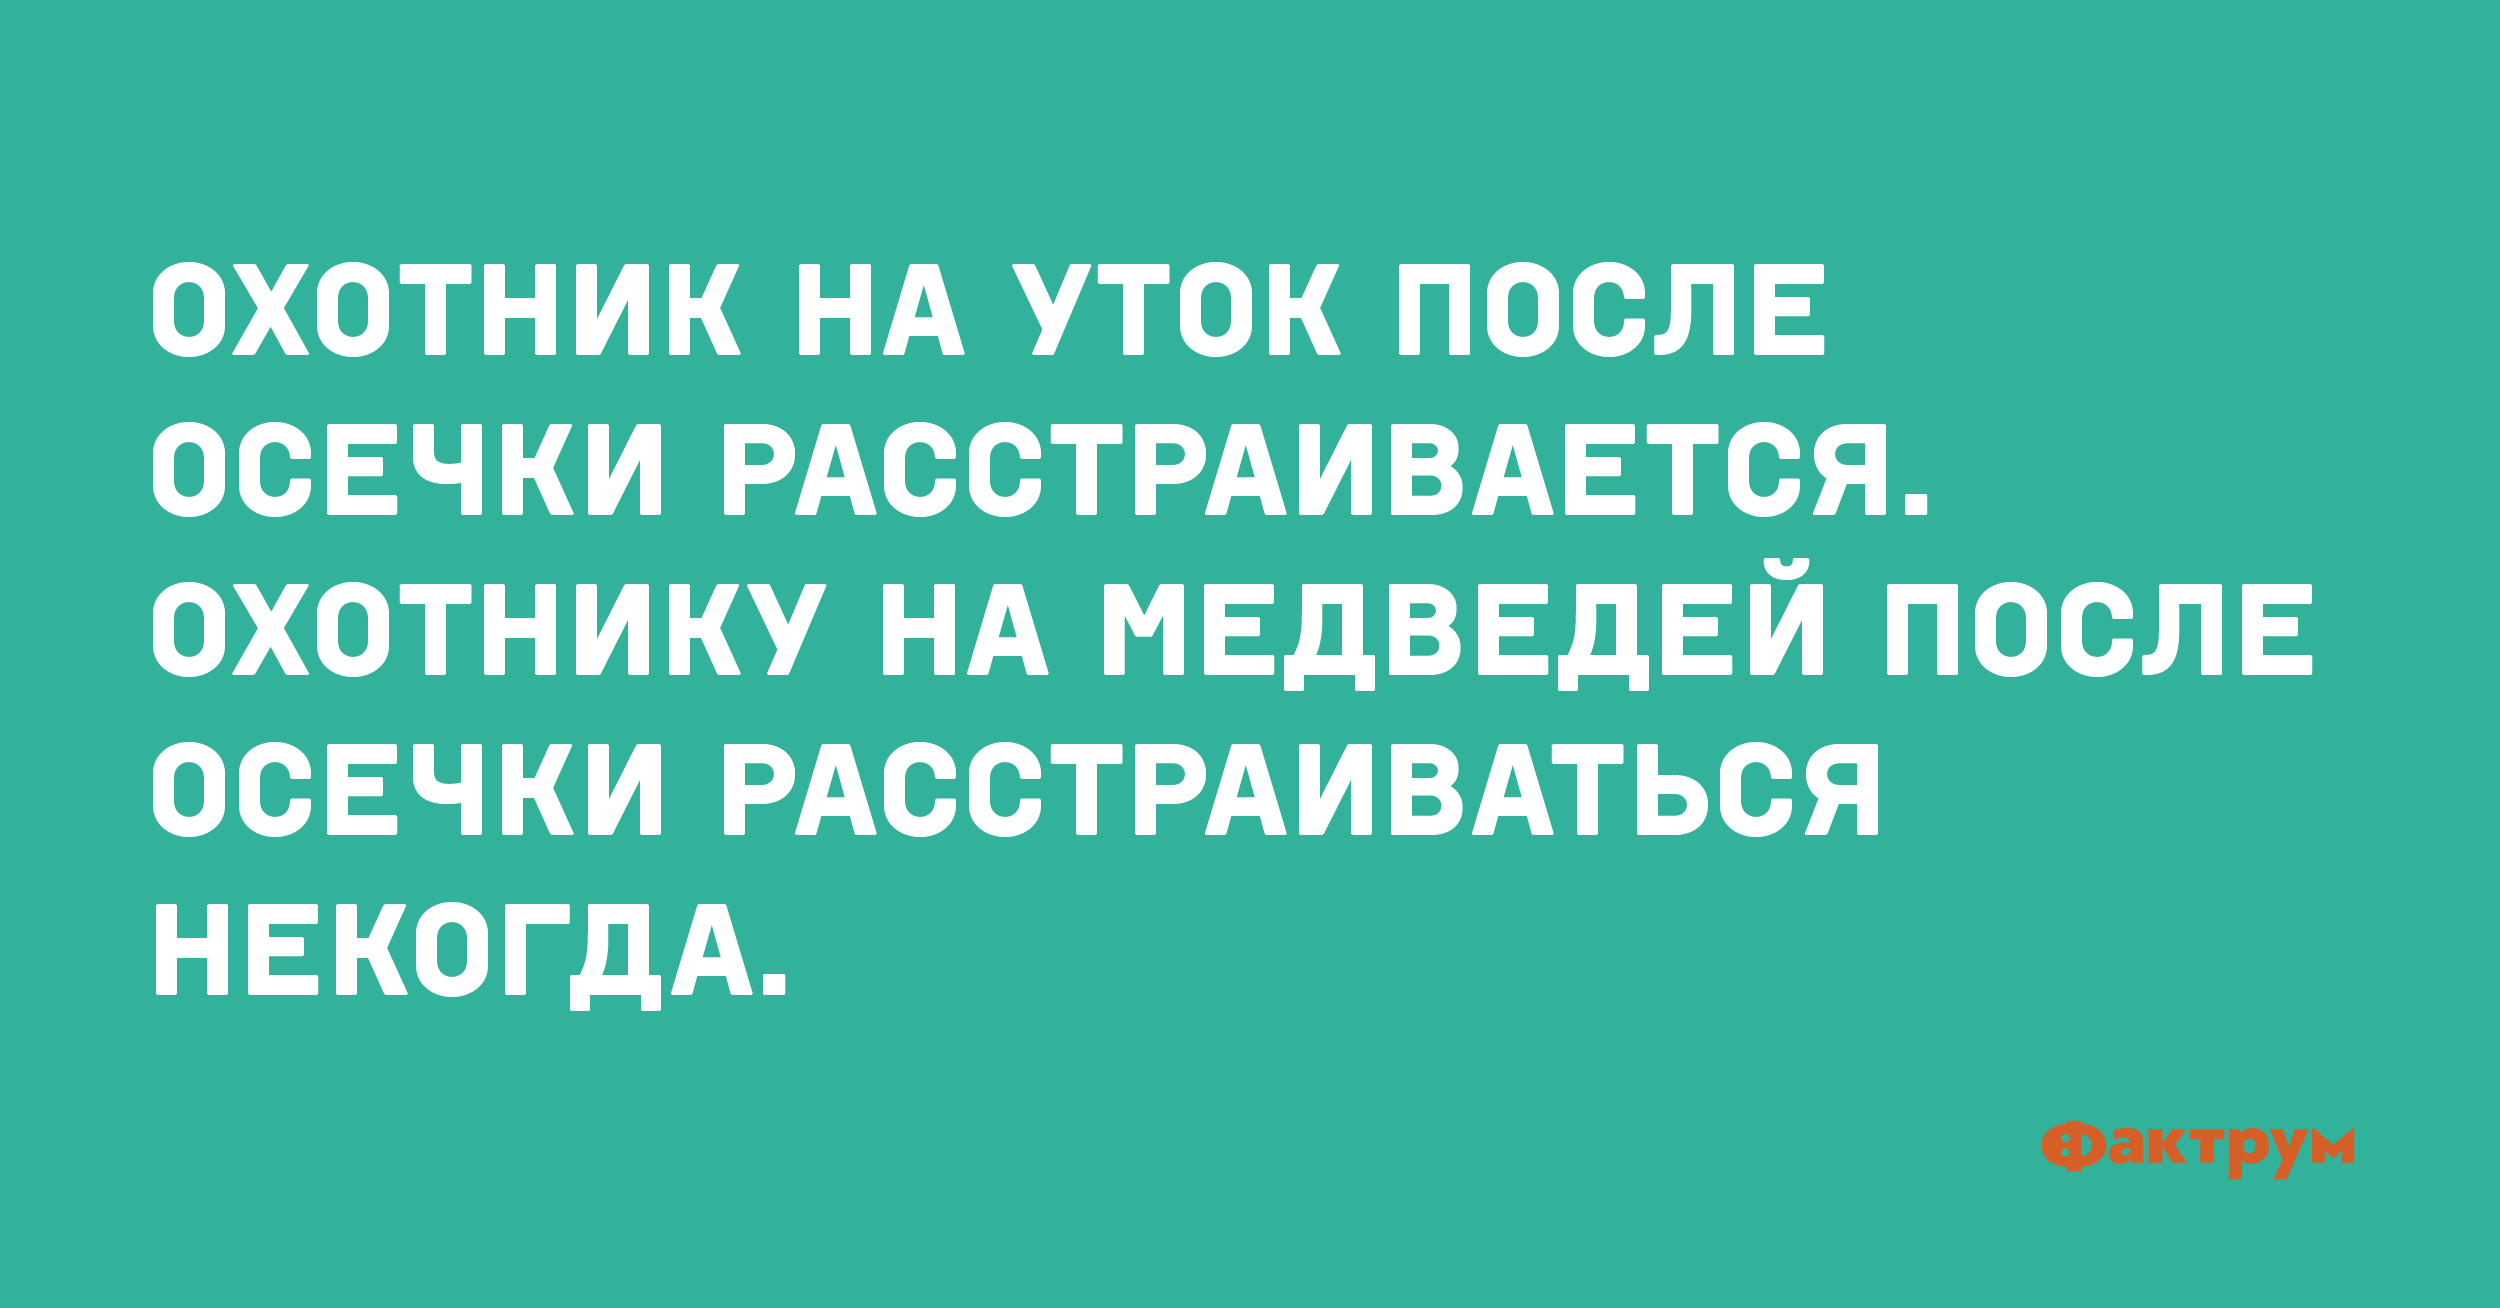 Анекдот Про Охотника